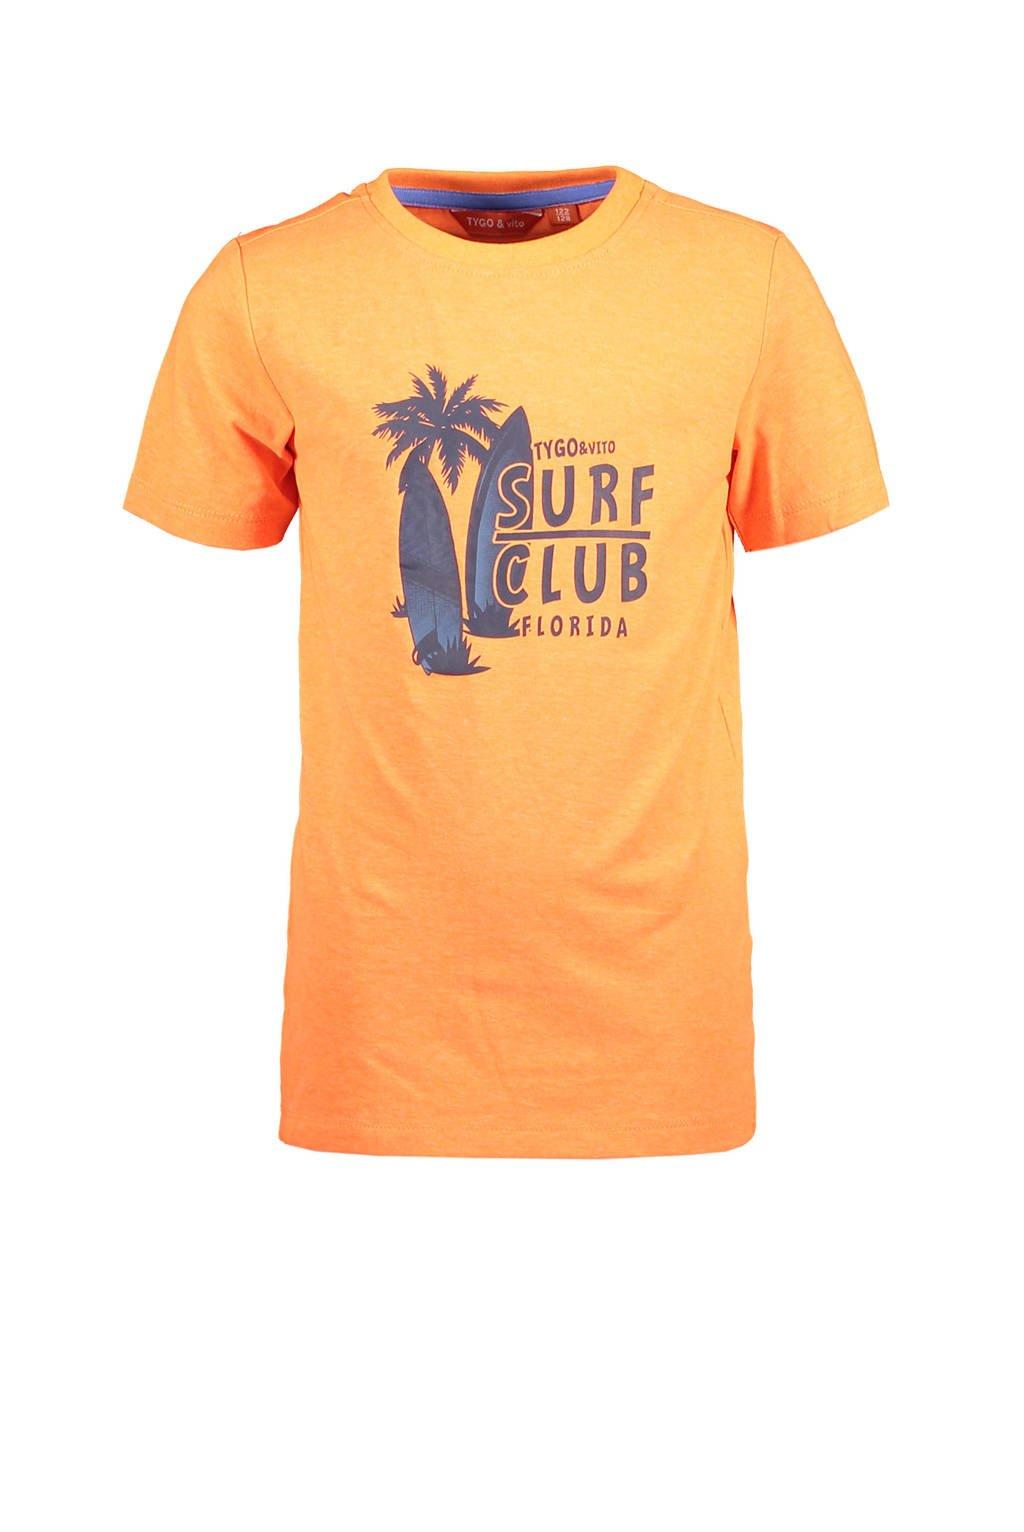 TYGO & vito T-shirt met printopdruk oranje, Oranje